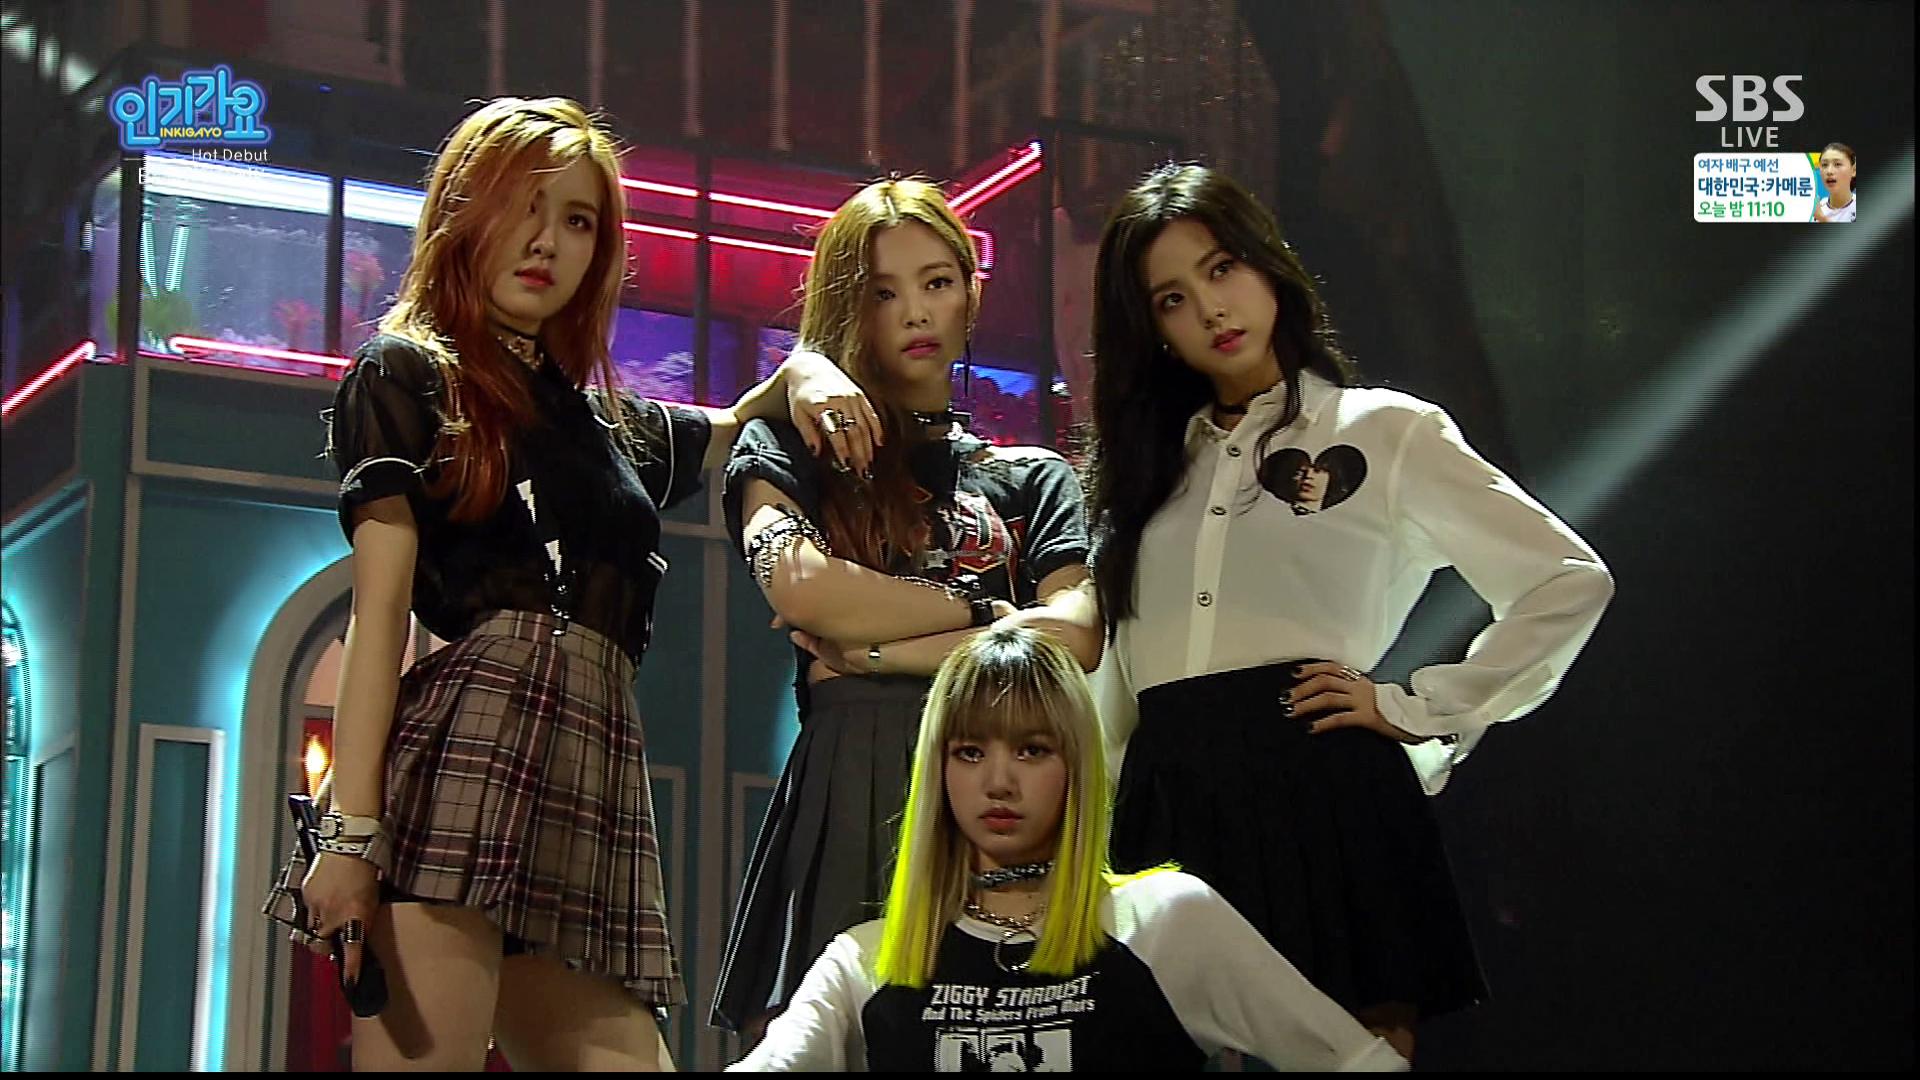 20160815.04.31 BLACKPINK - Boombayah (Inkigayo 2016.08.14 HDTV) (JPOP.ru).ts 1.jpg